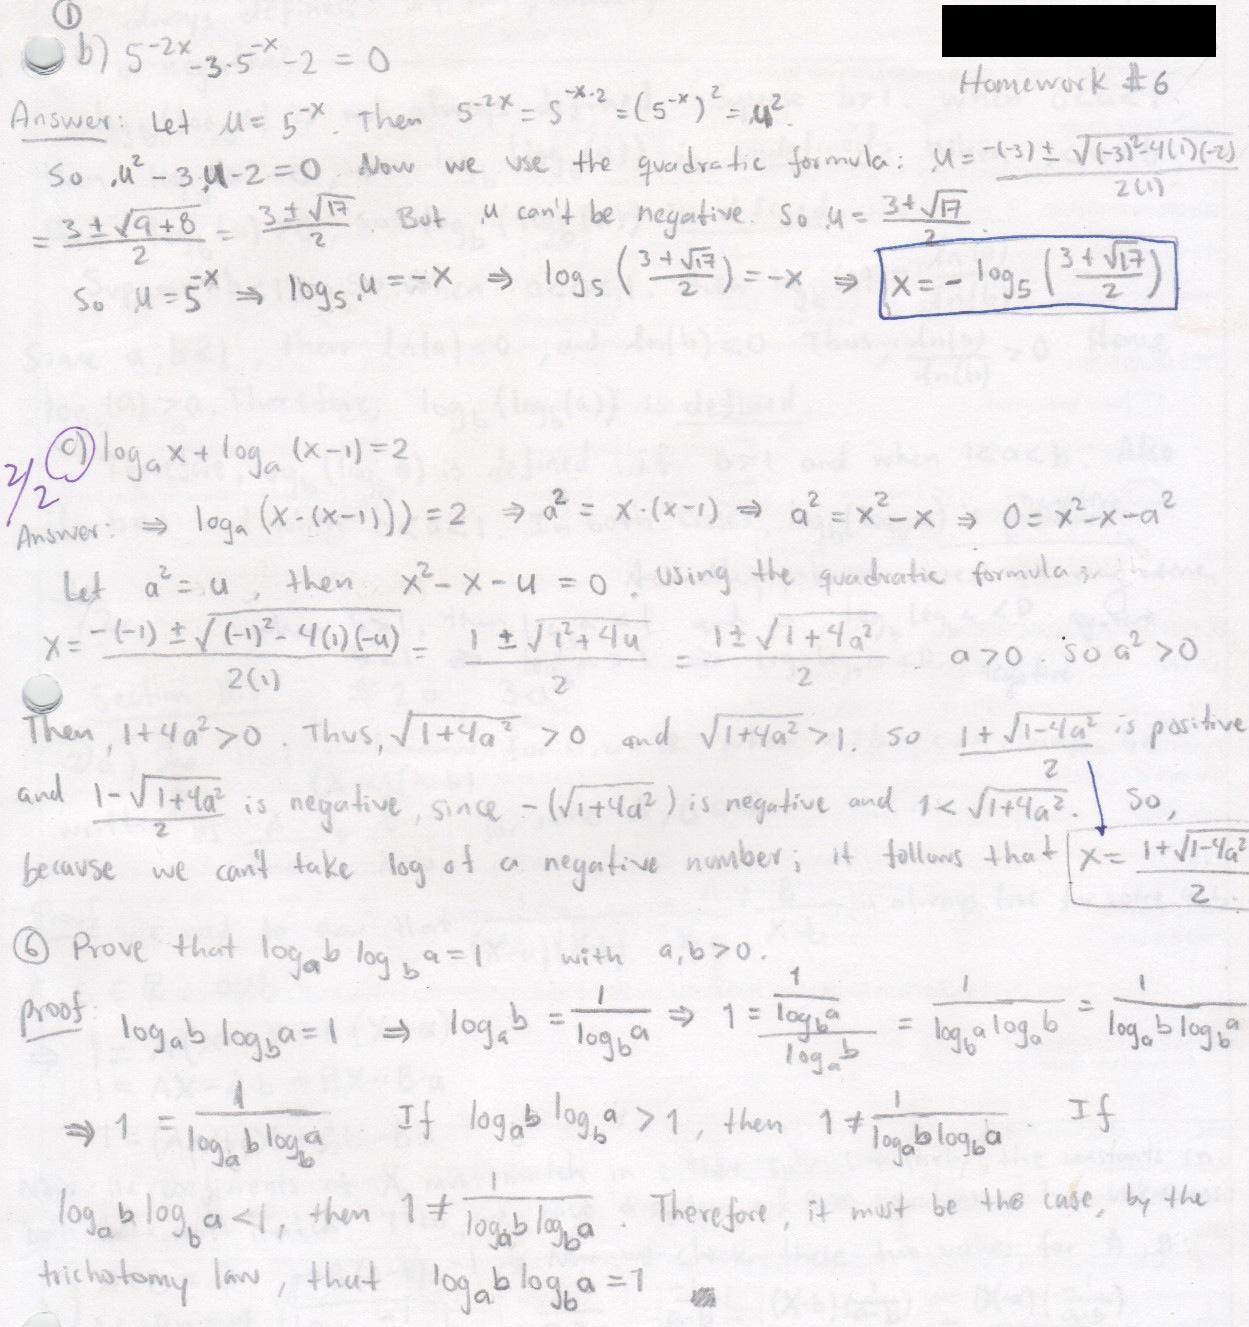 My old math homework from UC Berkeley : Math 152 hw6